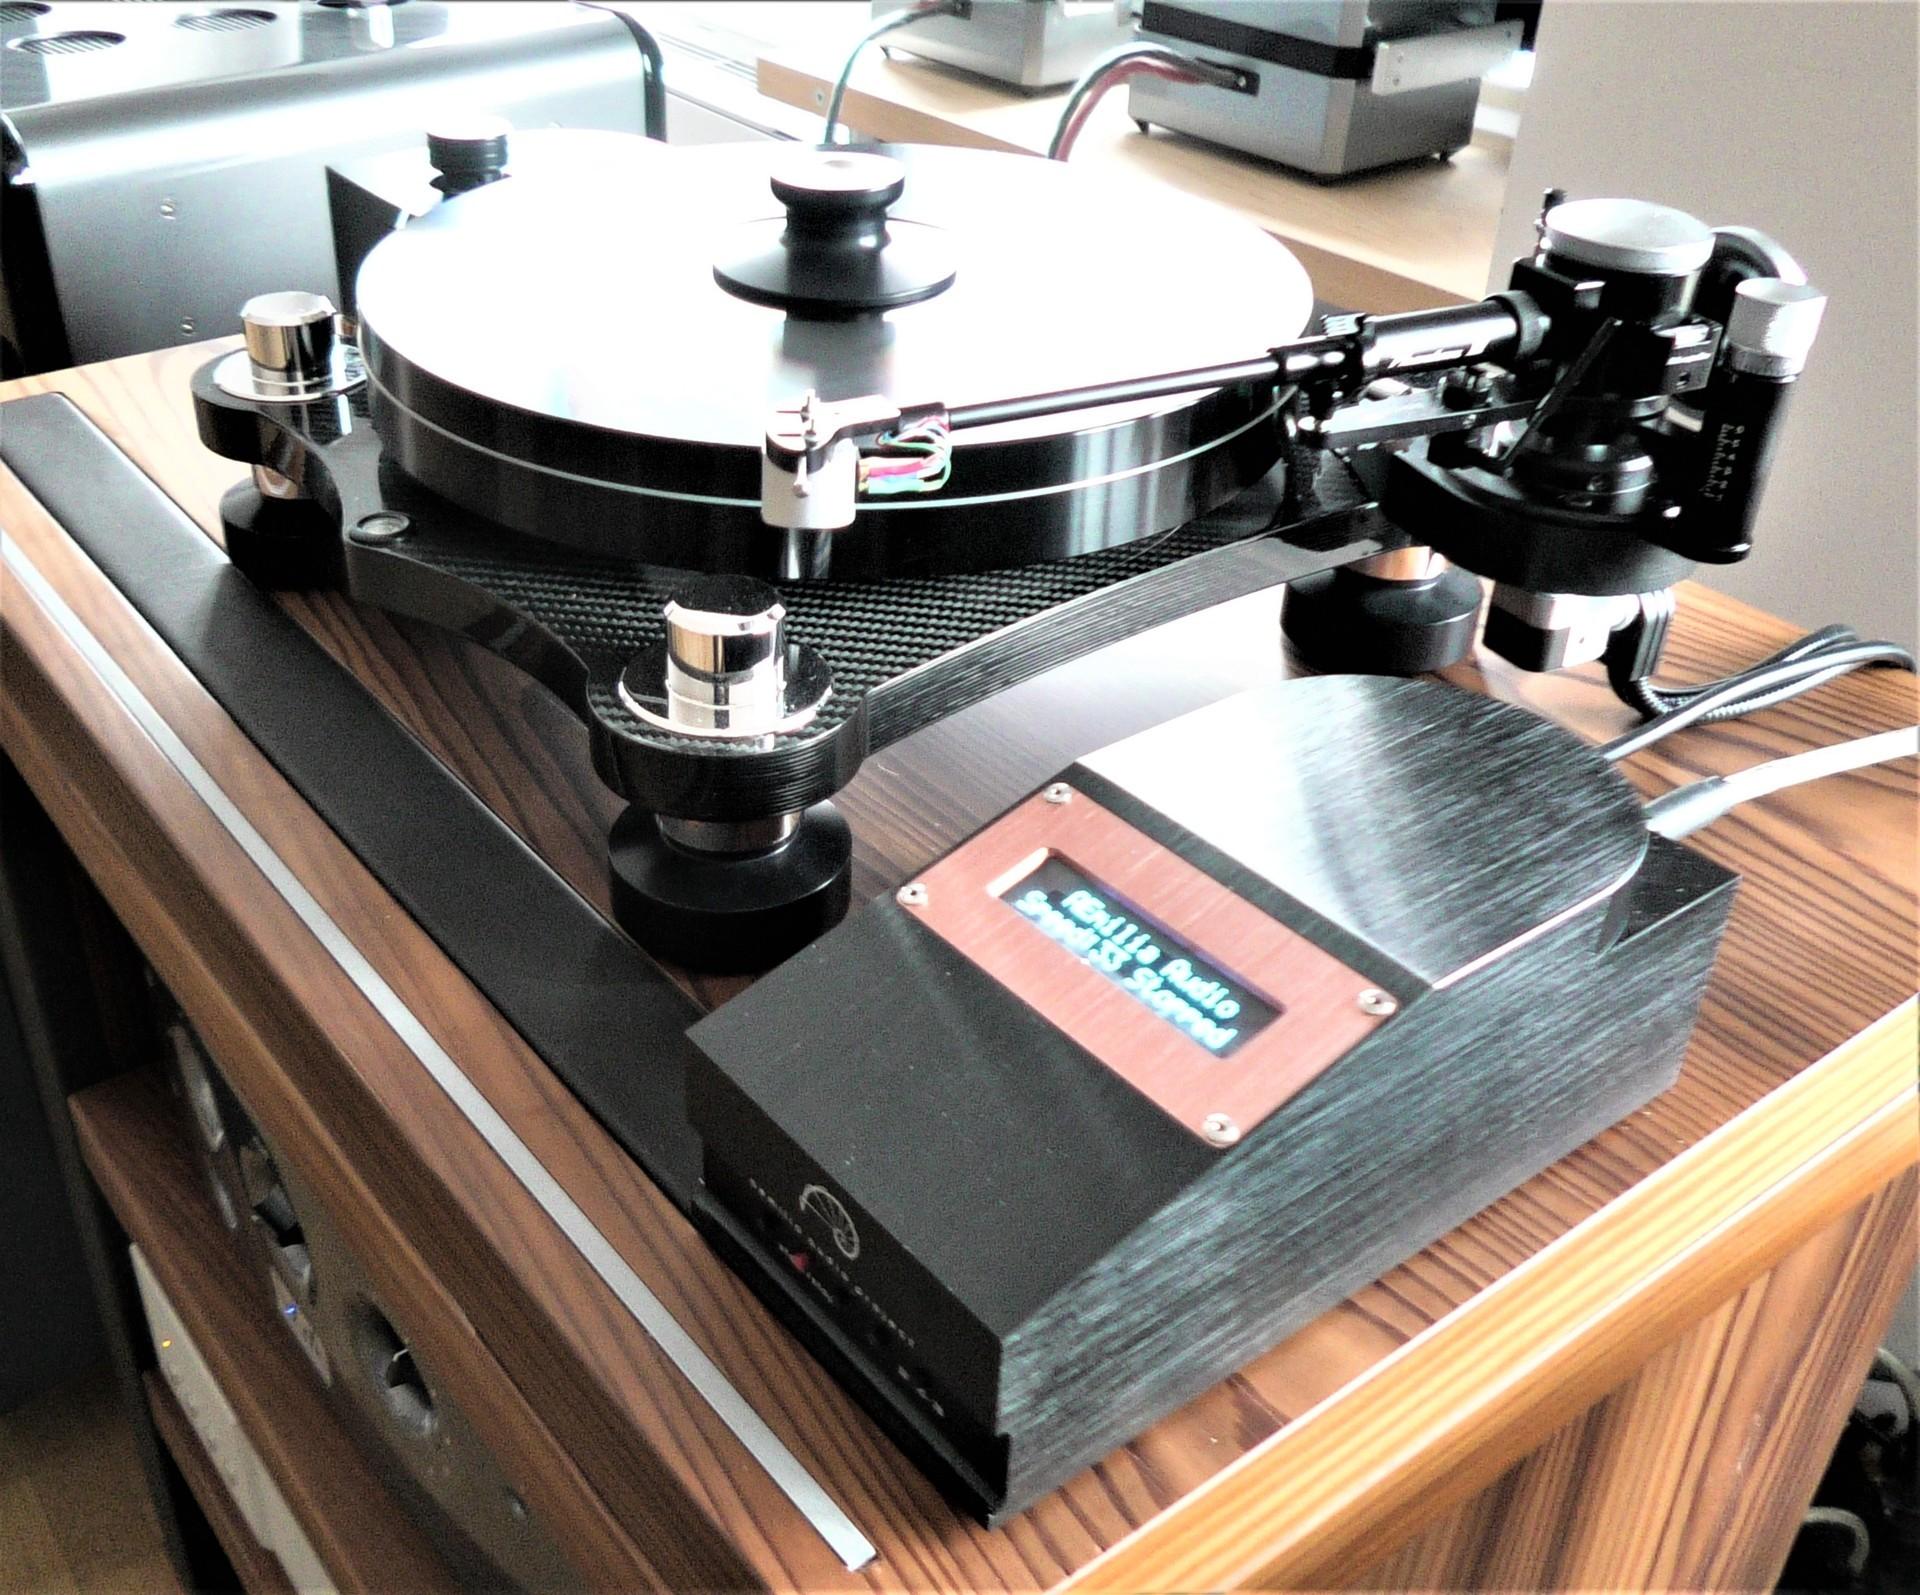 Nuovo riferimento: Giradischi Aemilia Audio Project – Quattro Rush